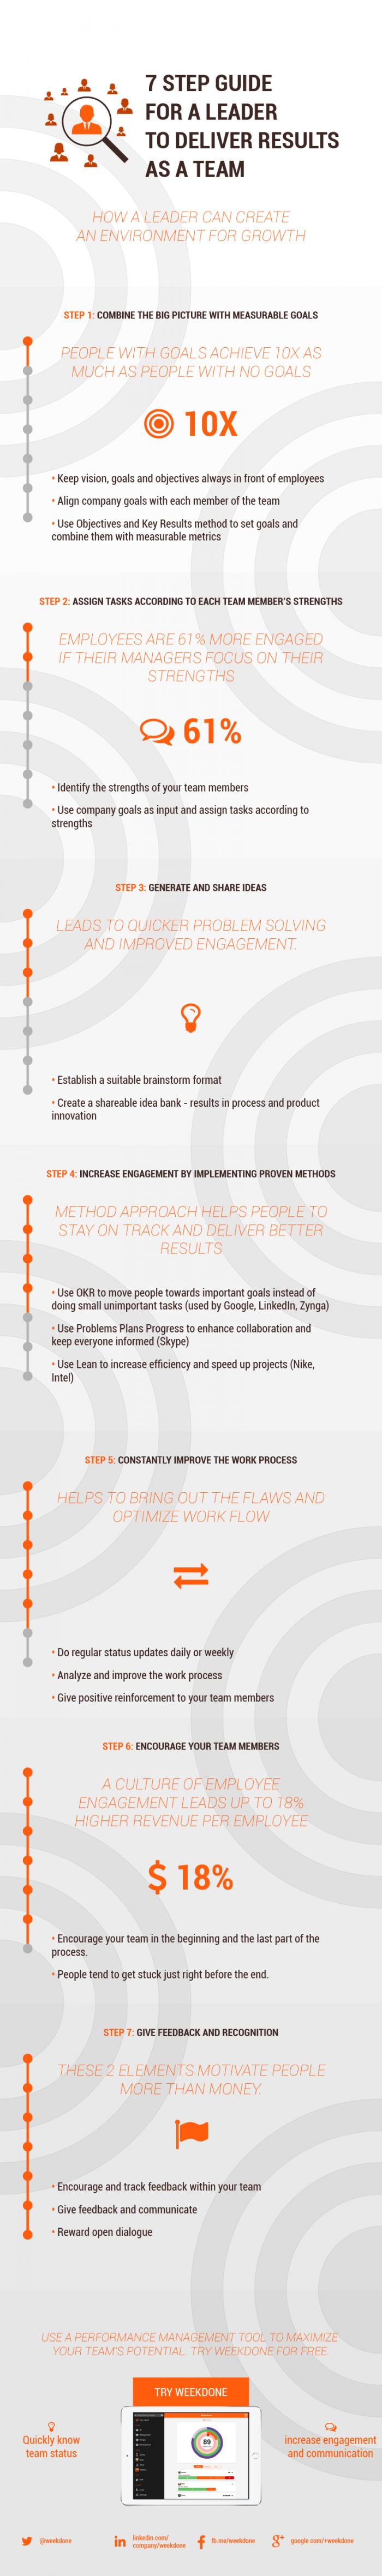 deliverresults-infographic-01